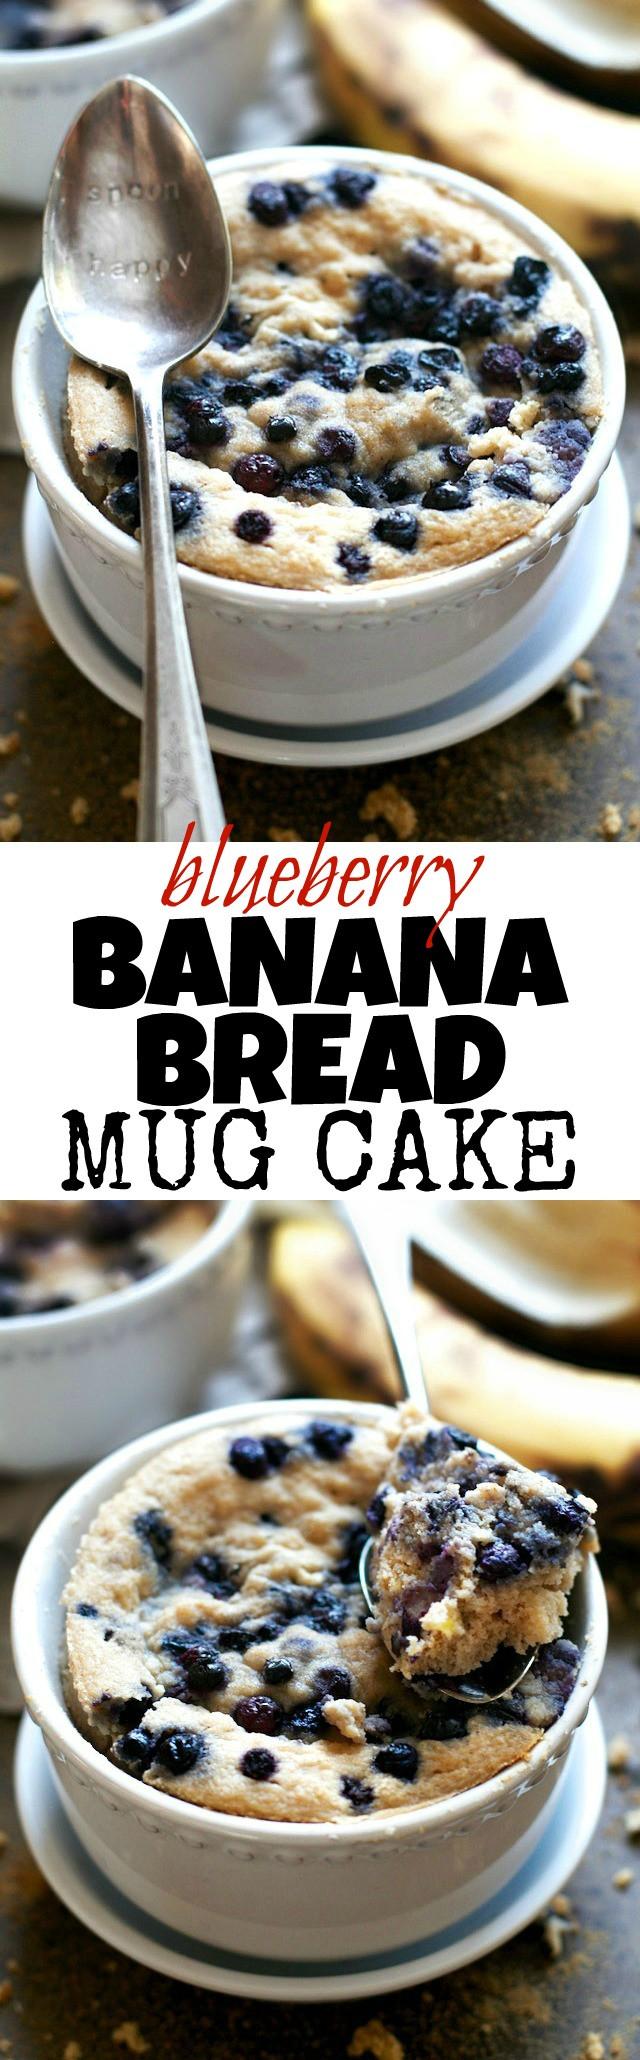 Healthy Banana Mug Cake  Blueberry Banana Bread Mug Cake